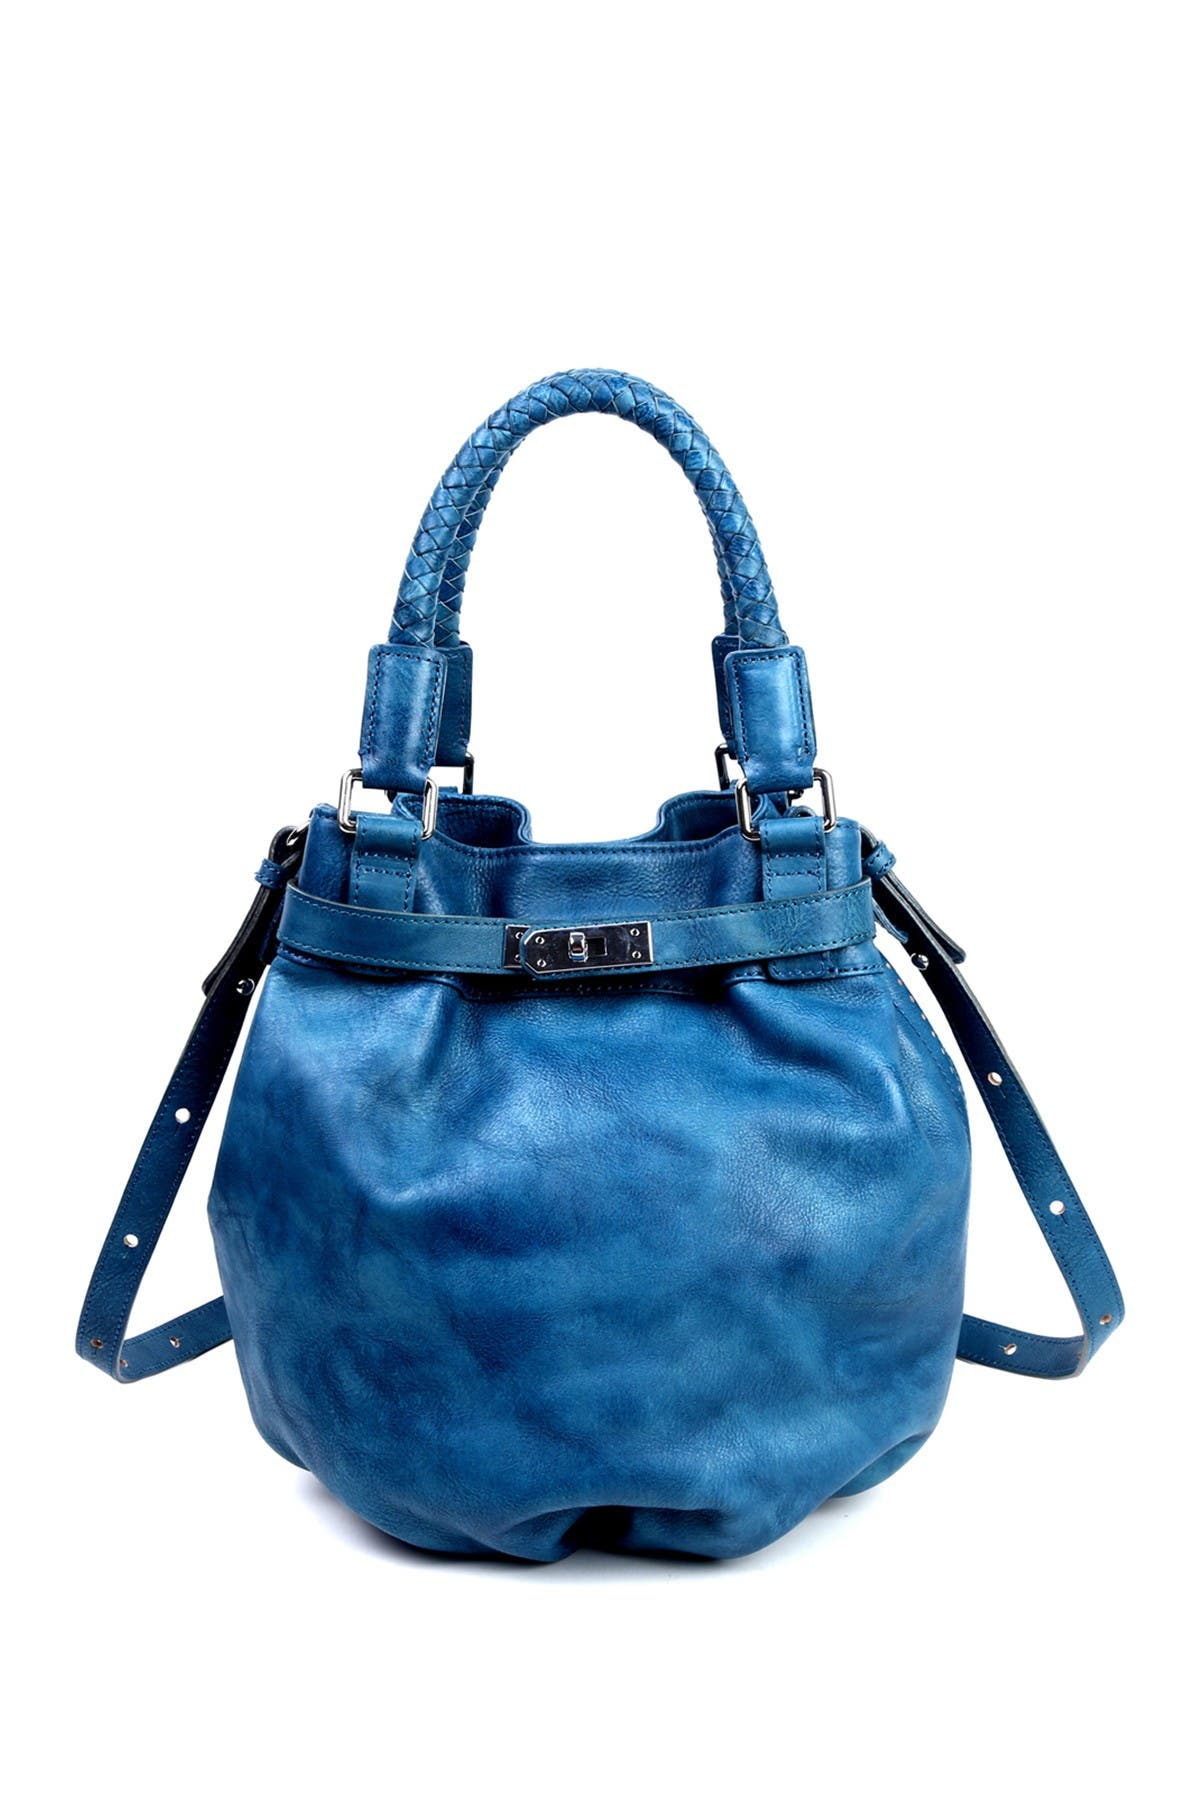 Image of Old Trend Leather Pumpkin Bucket Bag